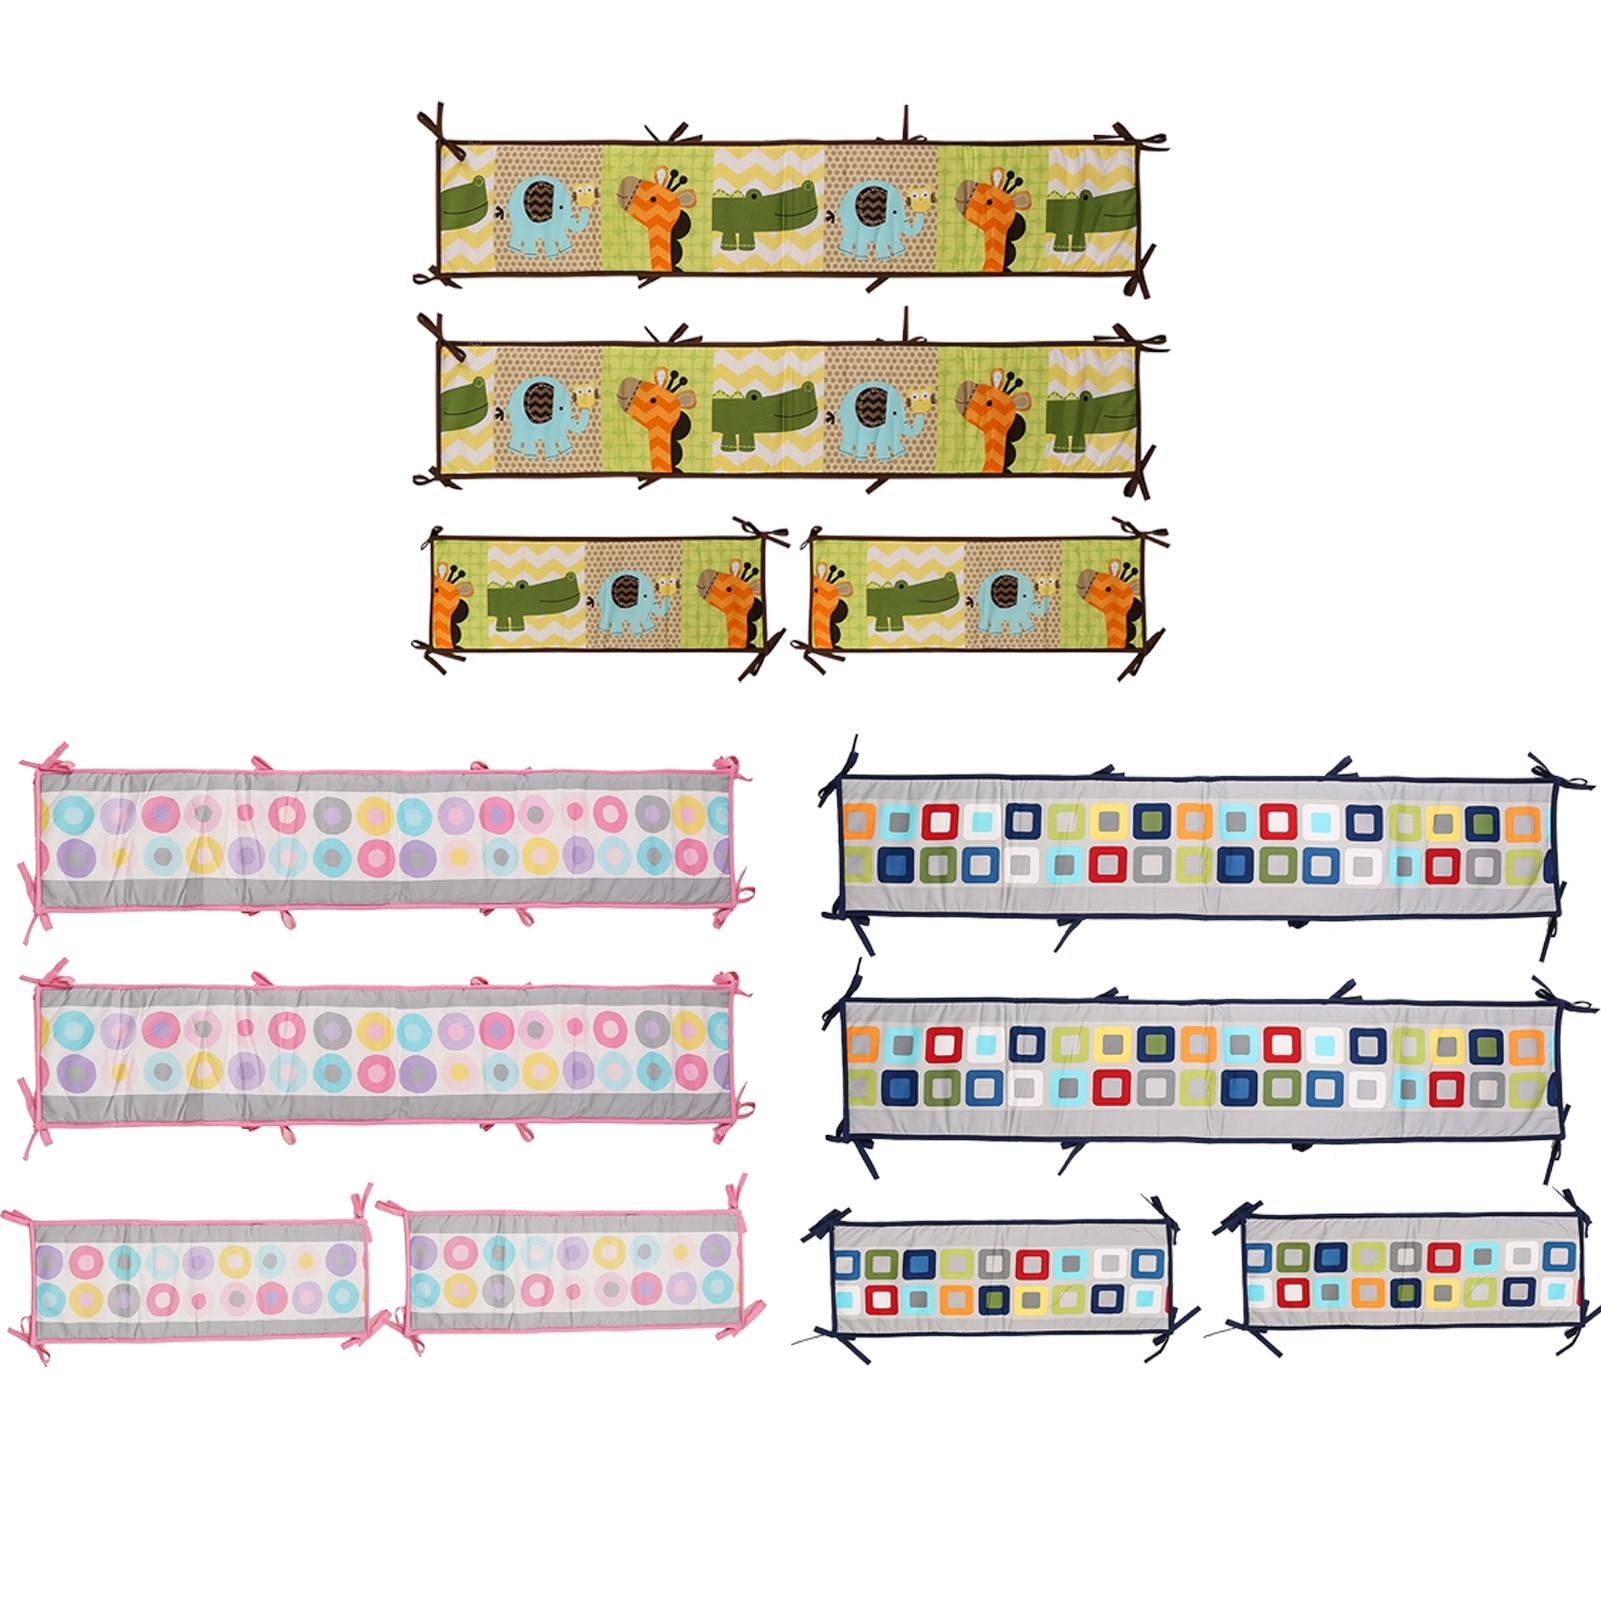 4Pcs Surrounding Baby Crib Bumpers Set Soft Baby Bed Circum Fence Infant Pillow Cushion Newborn Playpen Baby Room Decor Elegance